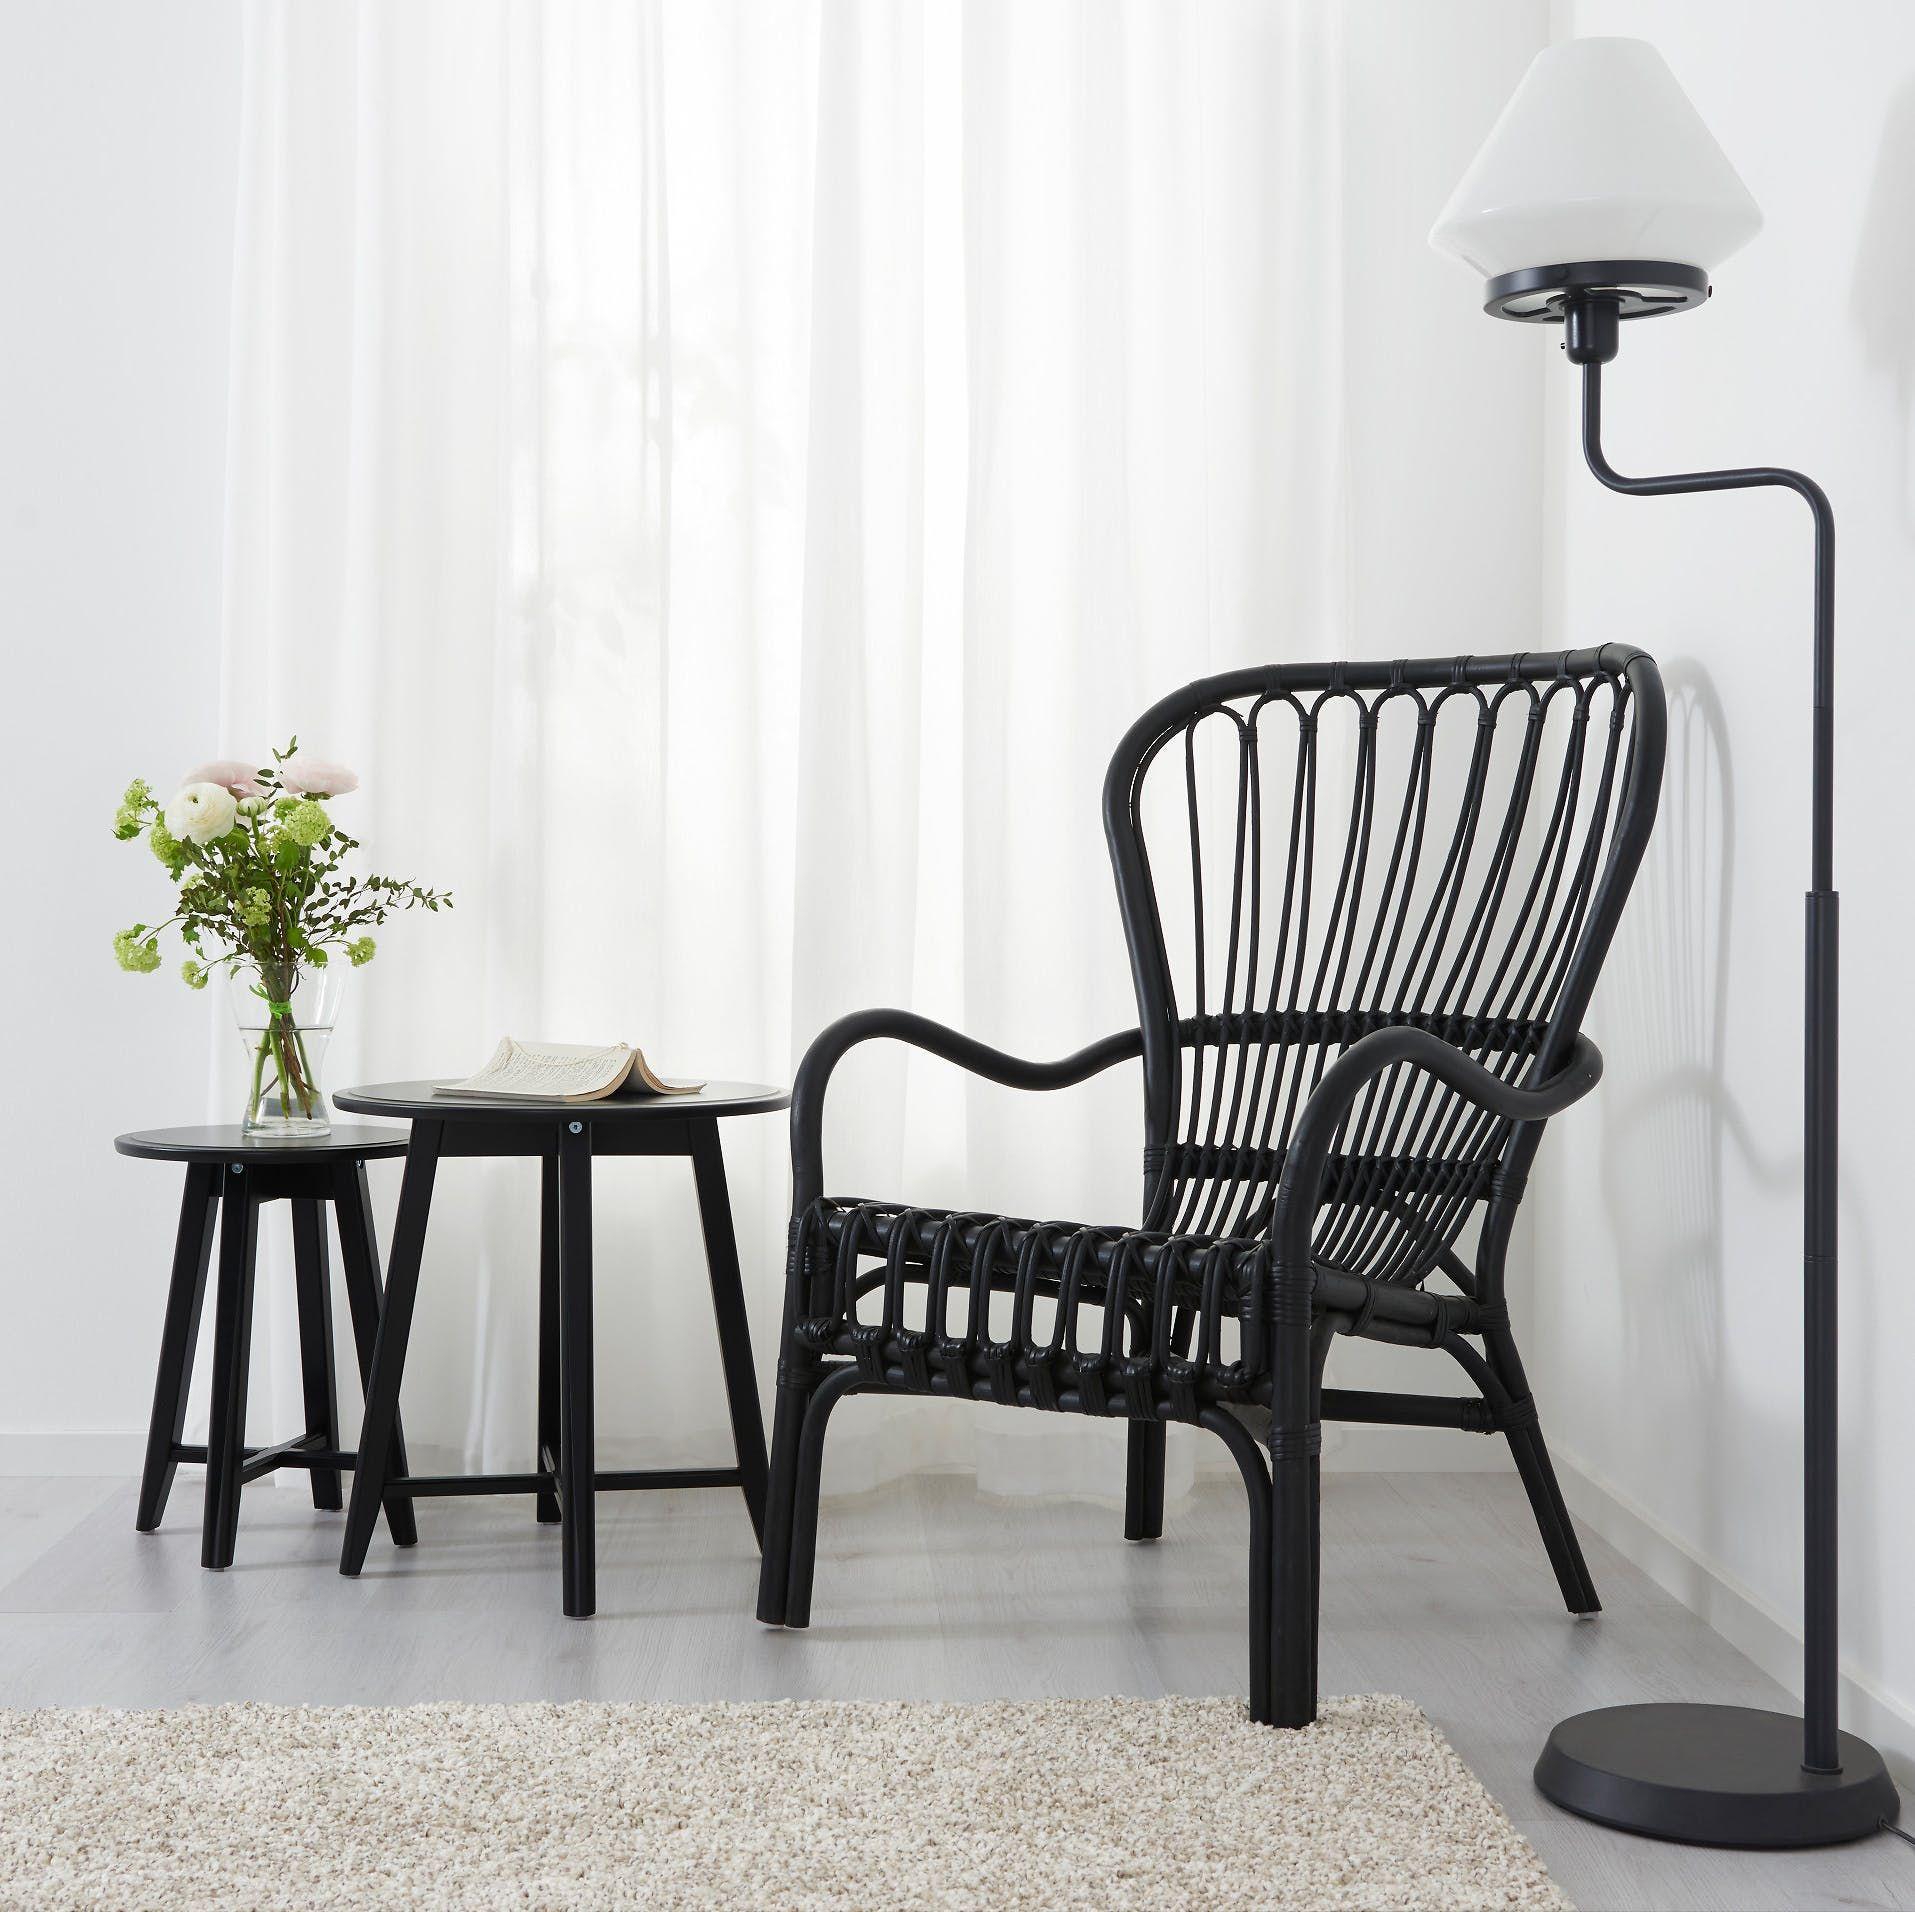 12 Really Good Looking Wicker & Rattan Chairs | Rattan, Wicker ...